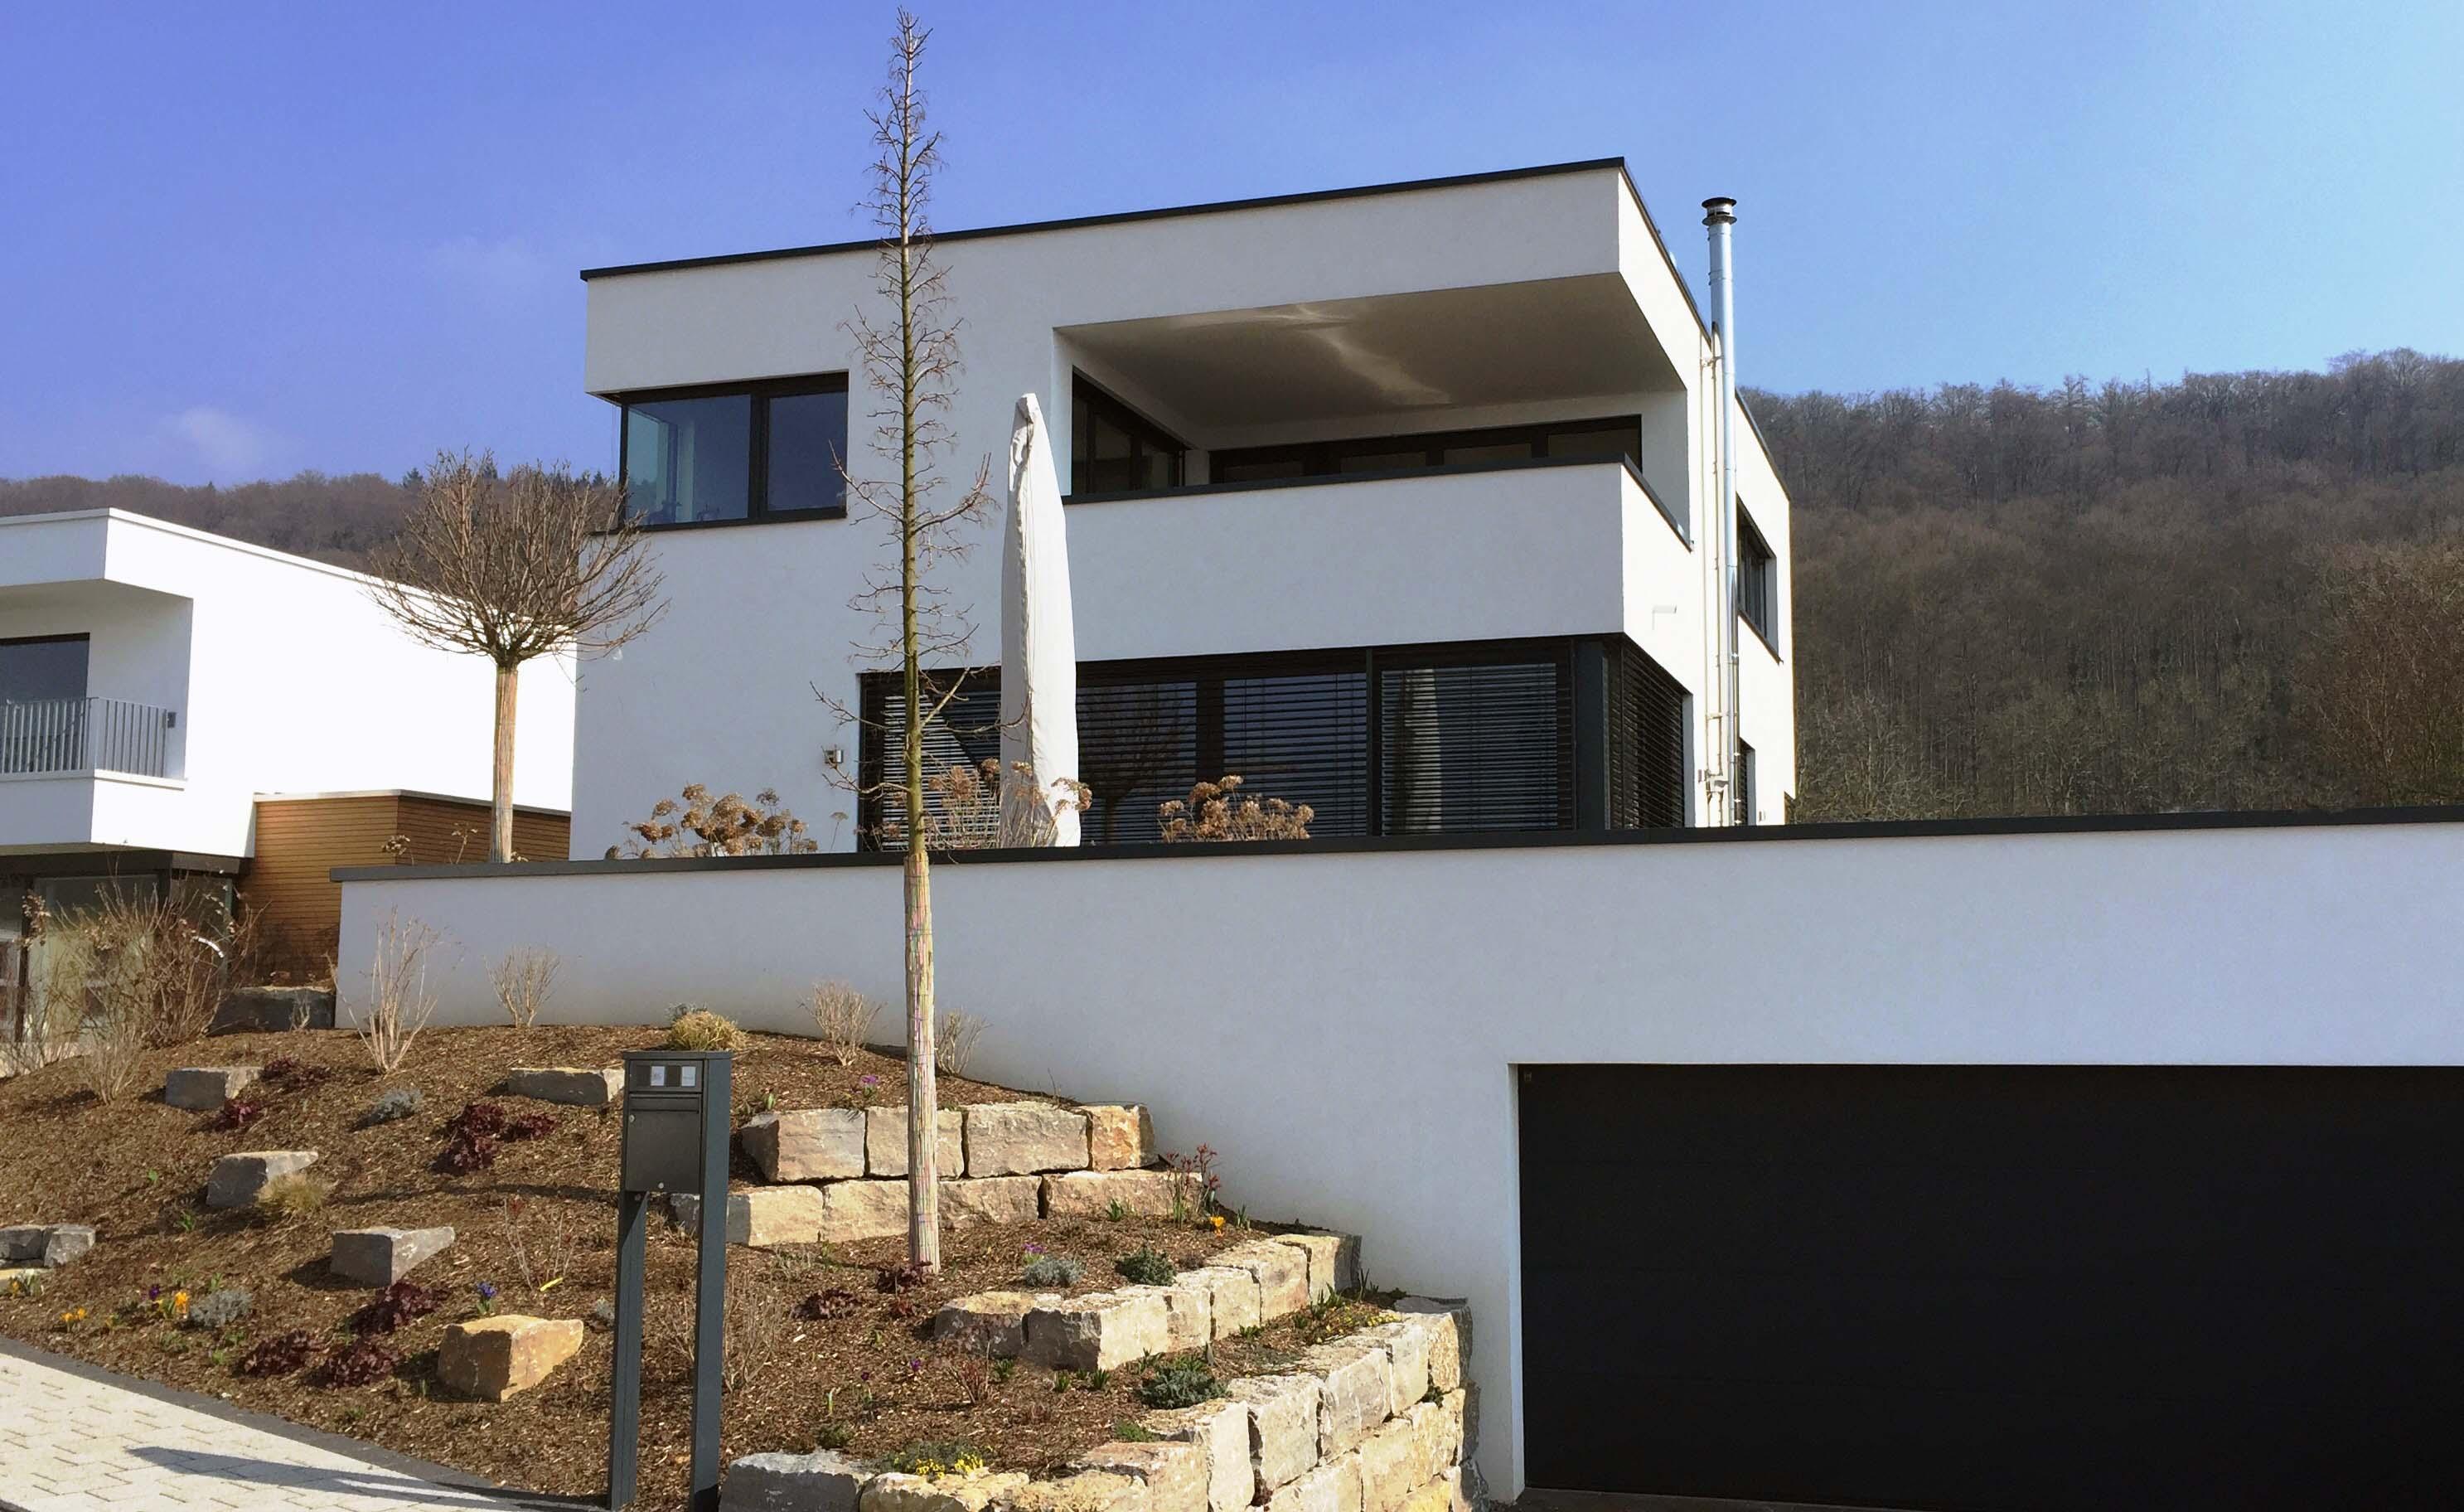 Architekt Heidelberg architekt heidelberg nordhausen l dachstudio am neckar in hd